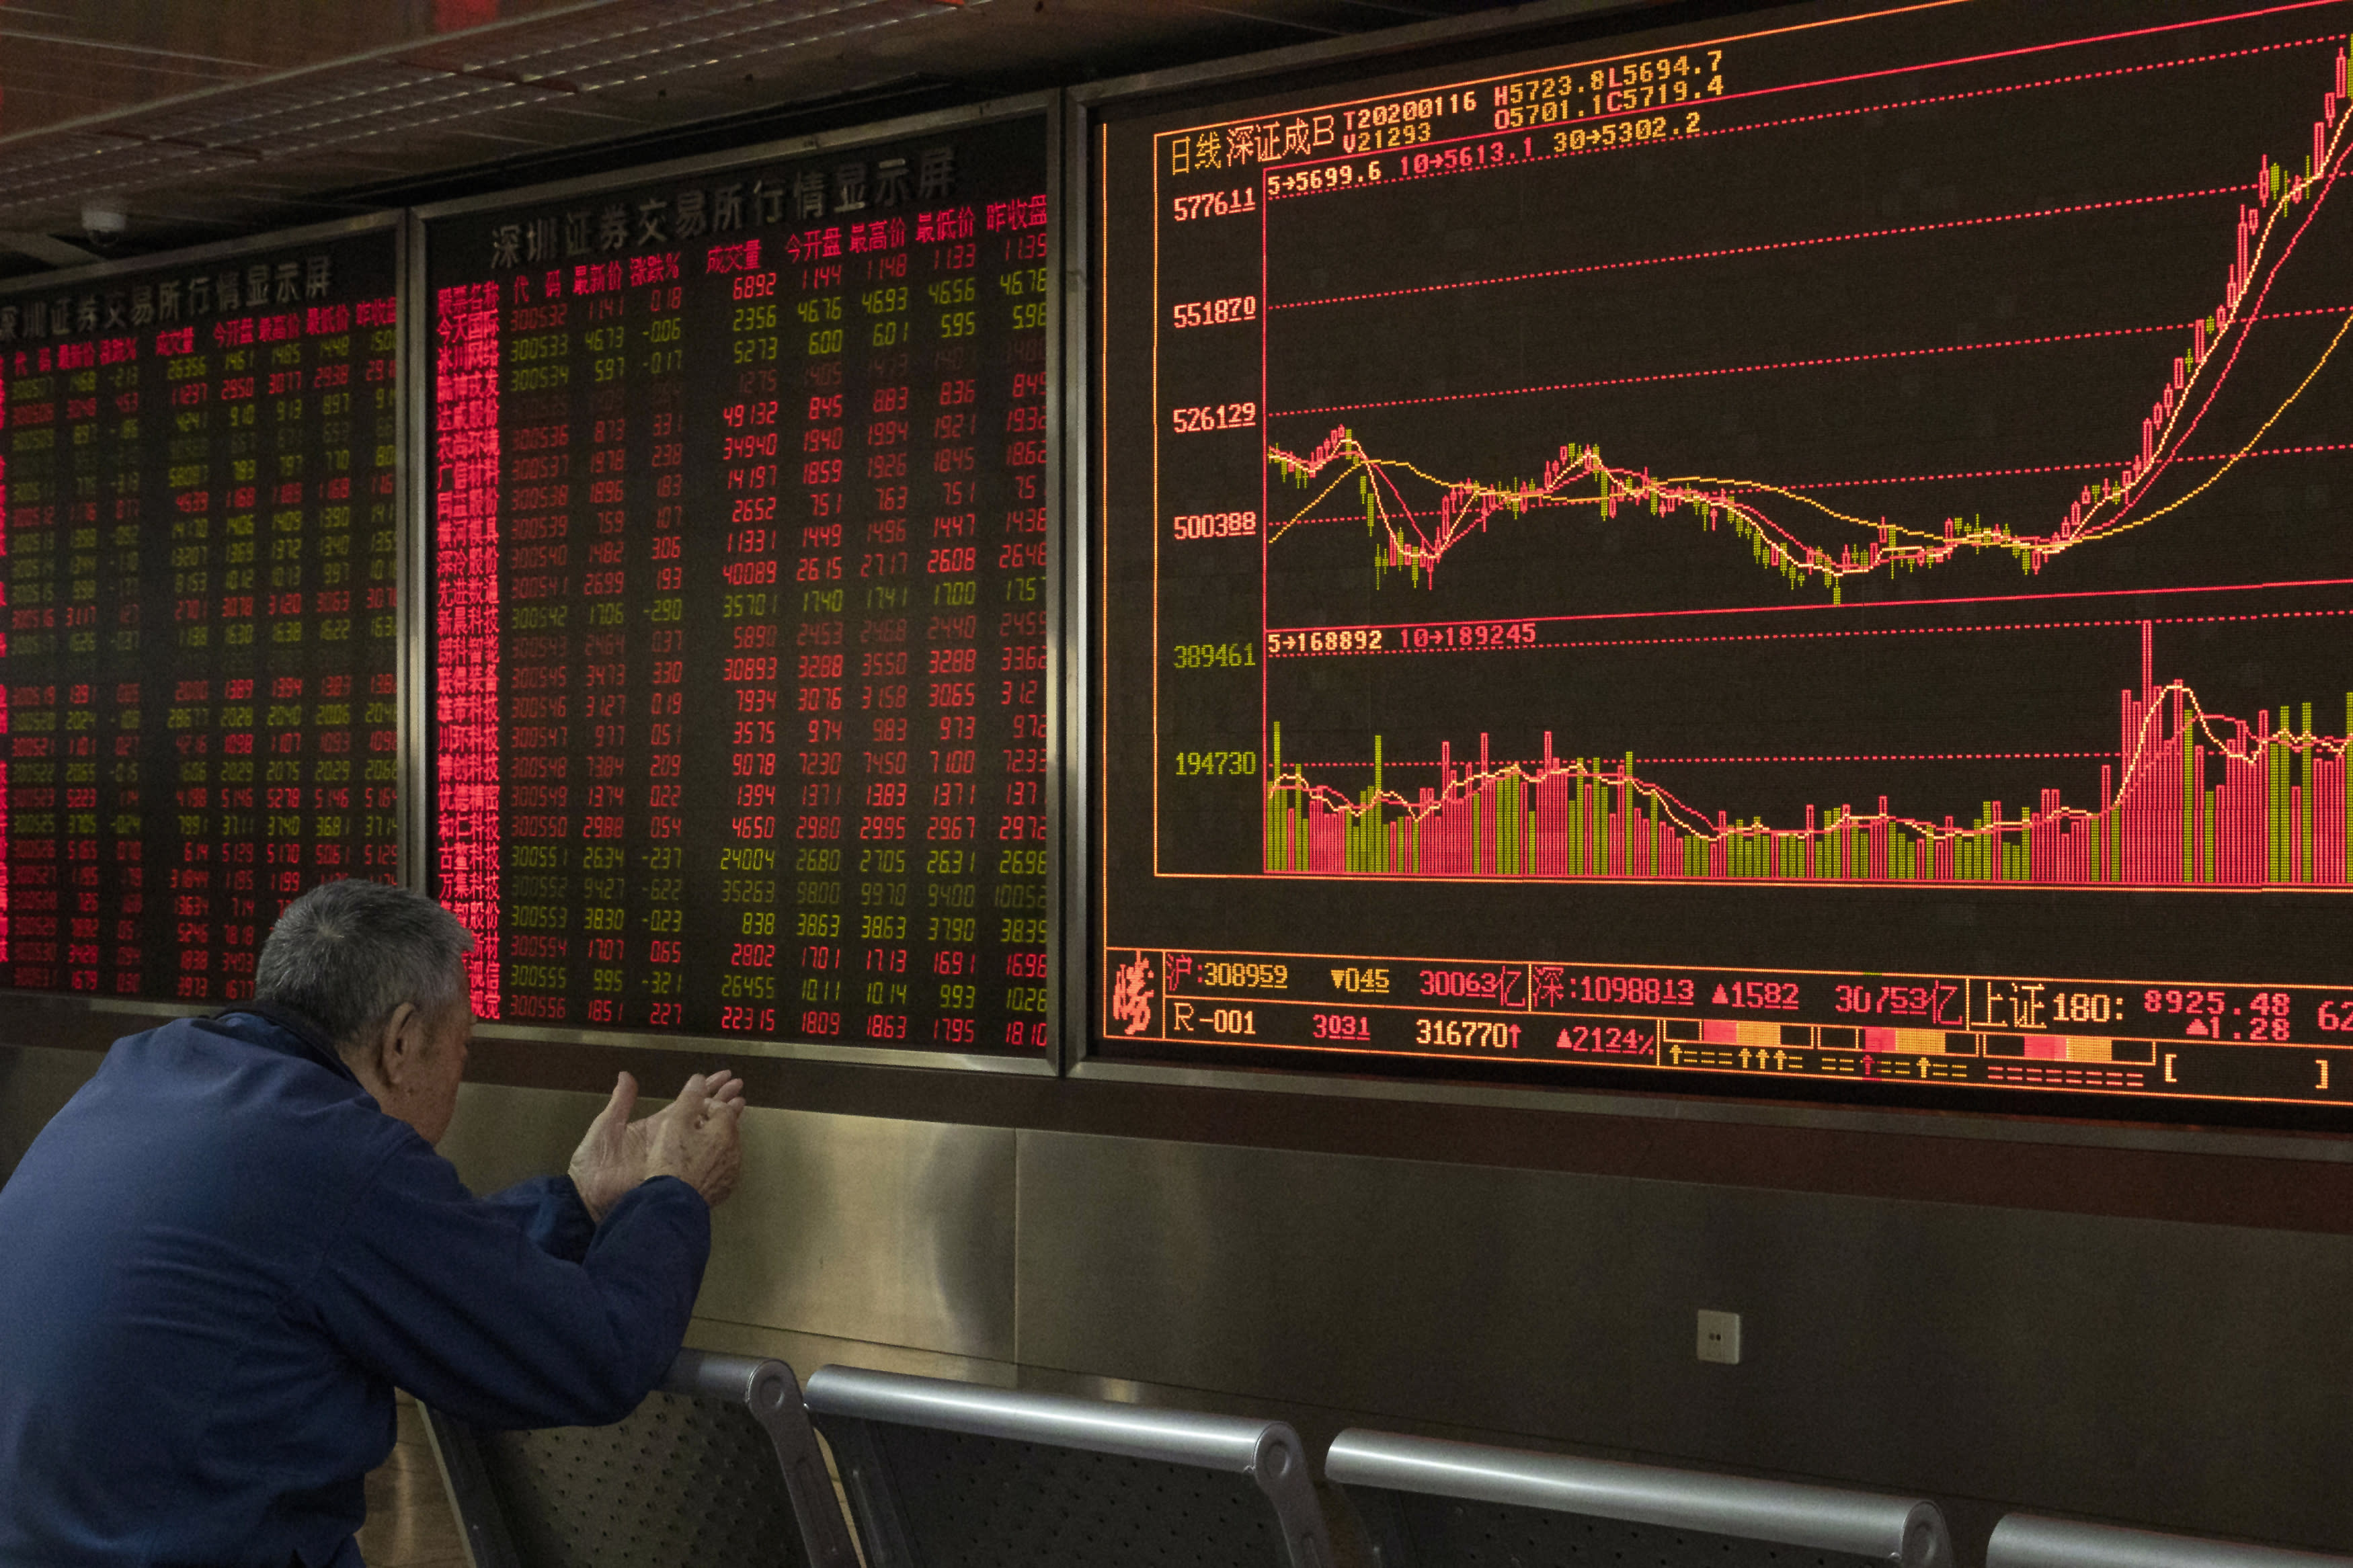 Shanghai stocks plunge as coronavirus spreads